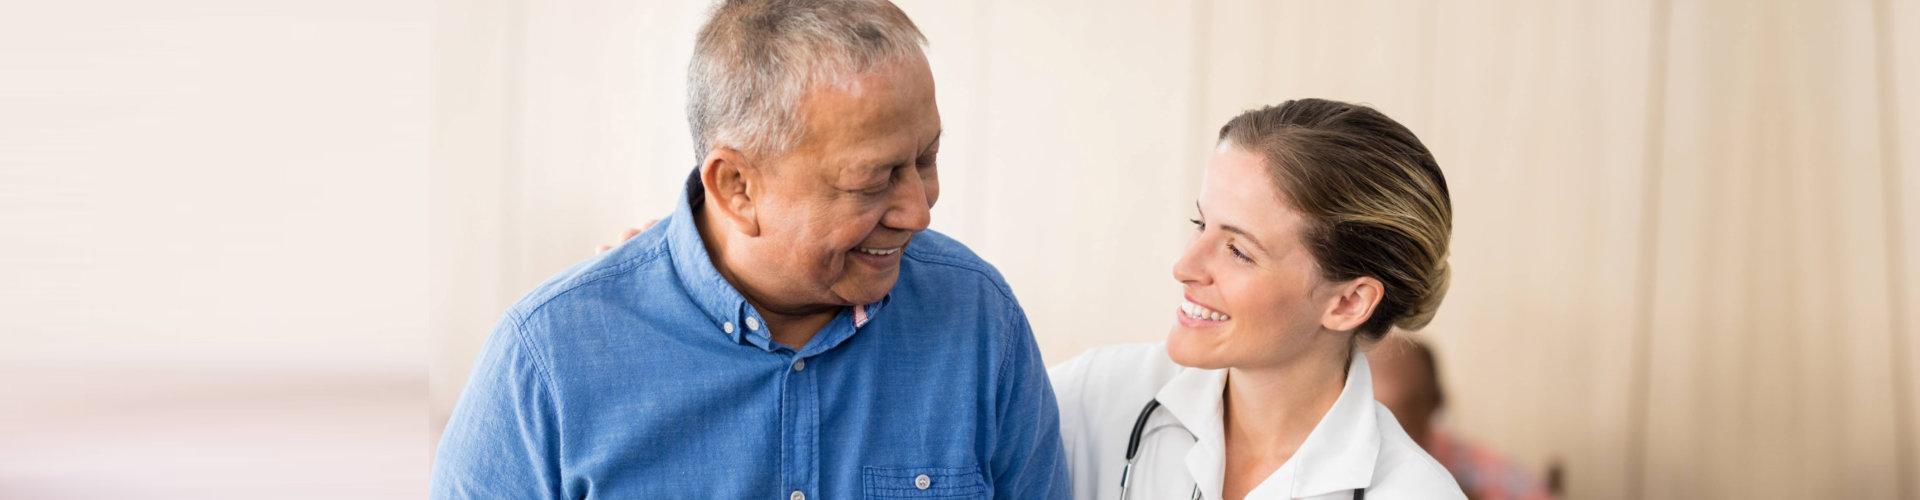 healthcare professional with senior